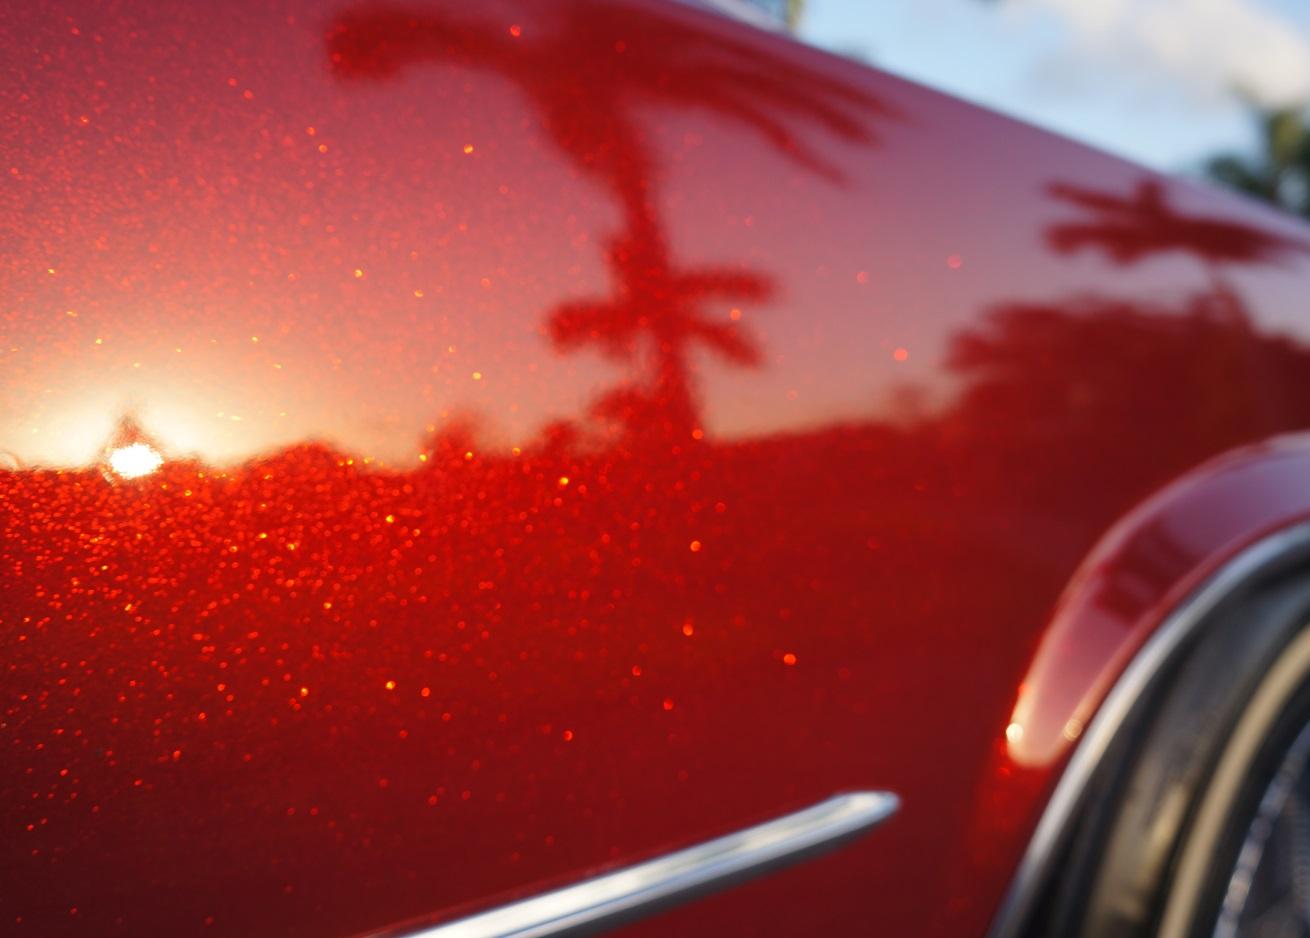 Покраска автомобилей краской Candy